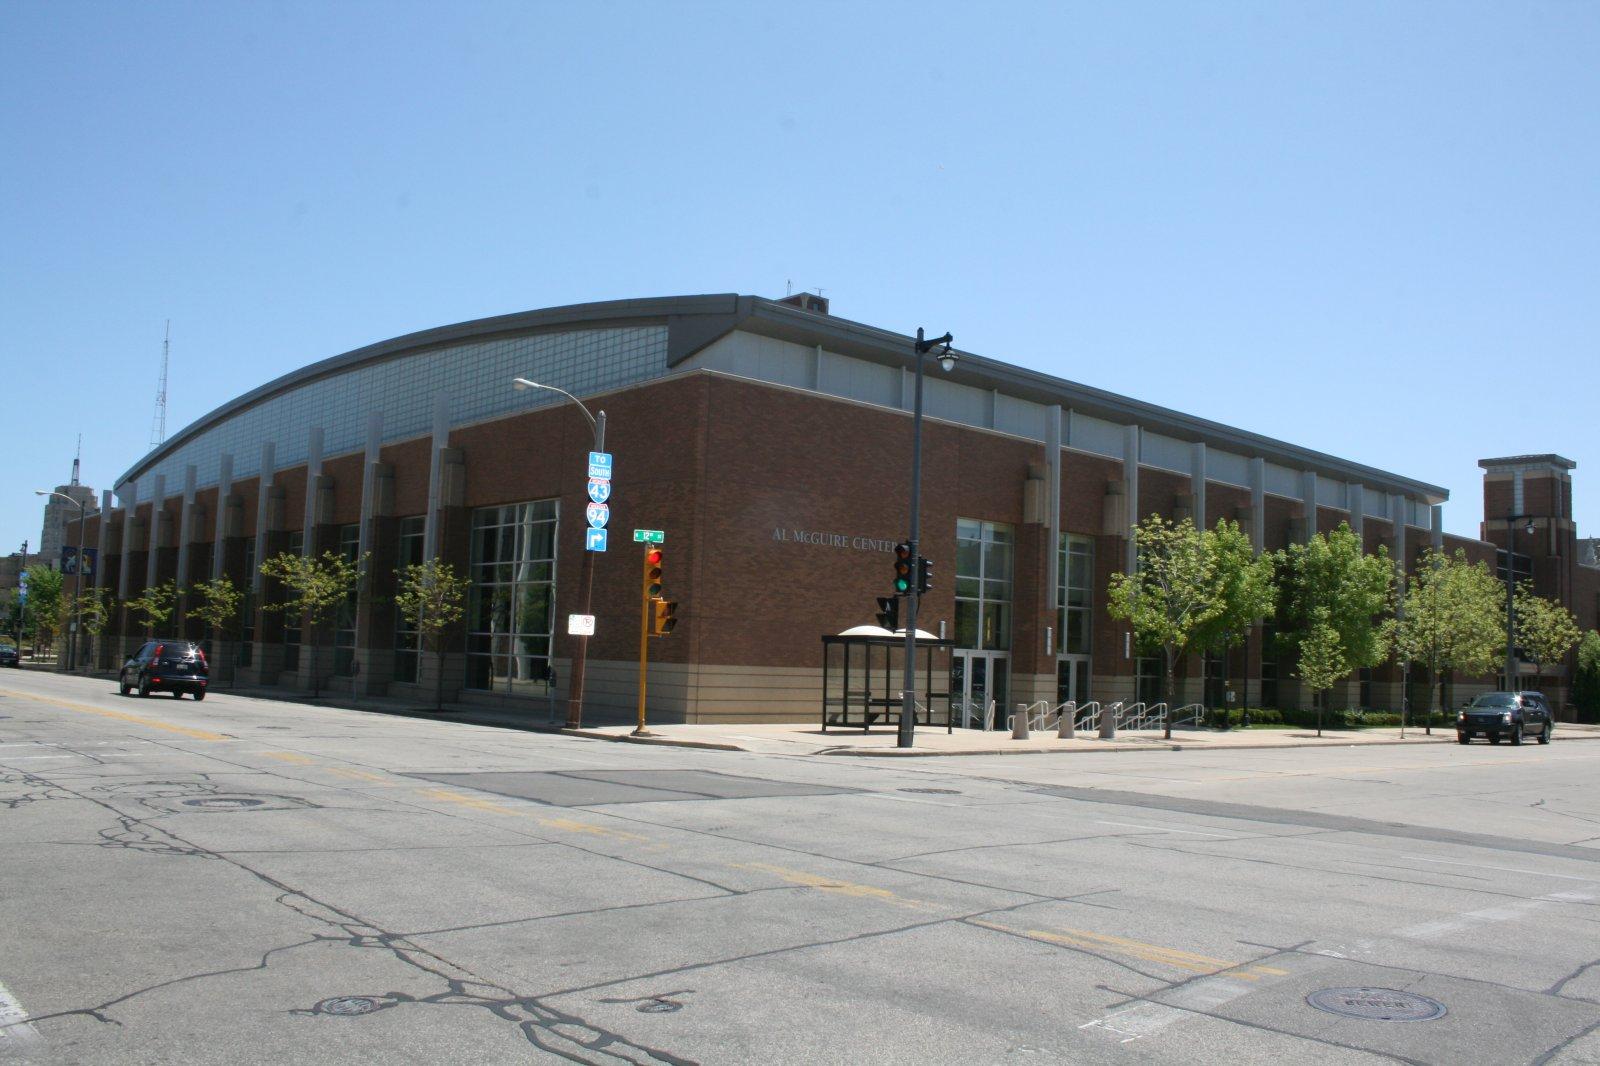 Al McGuire Center - Marquette University Athletics.